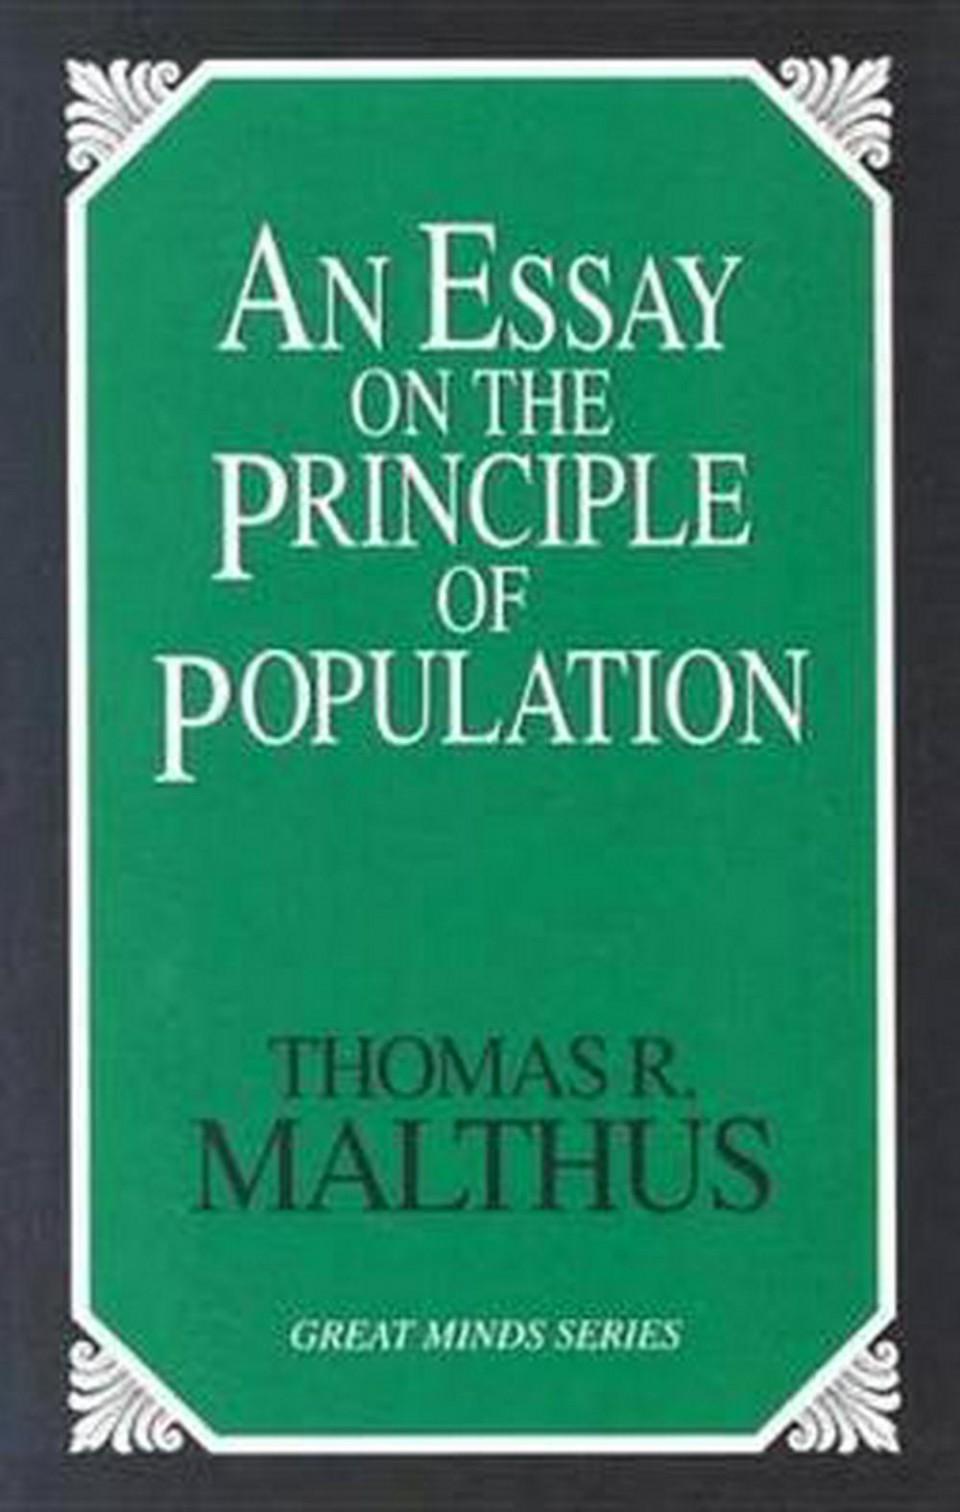 023 Essay Example On The Principle Of Population Singular Malthus Sparknotes Thomas Main Idea 960